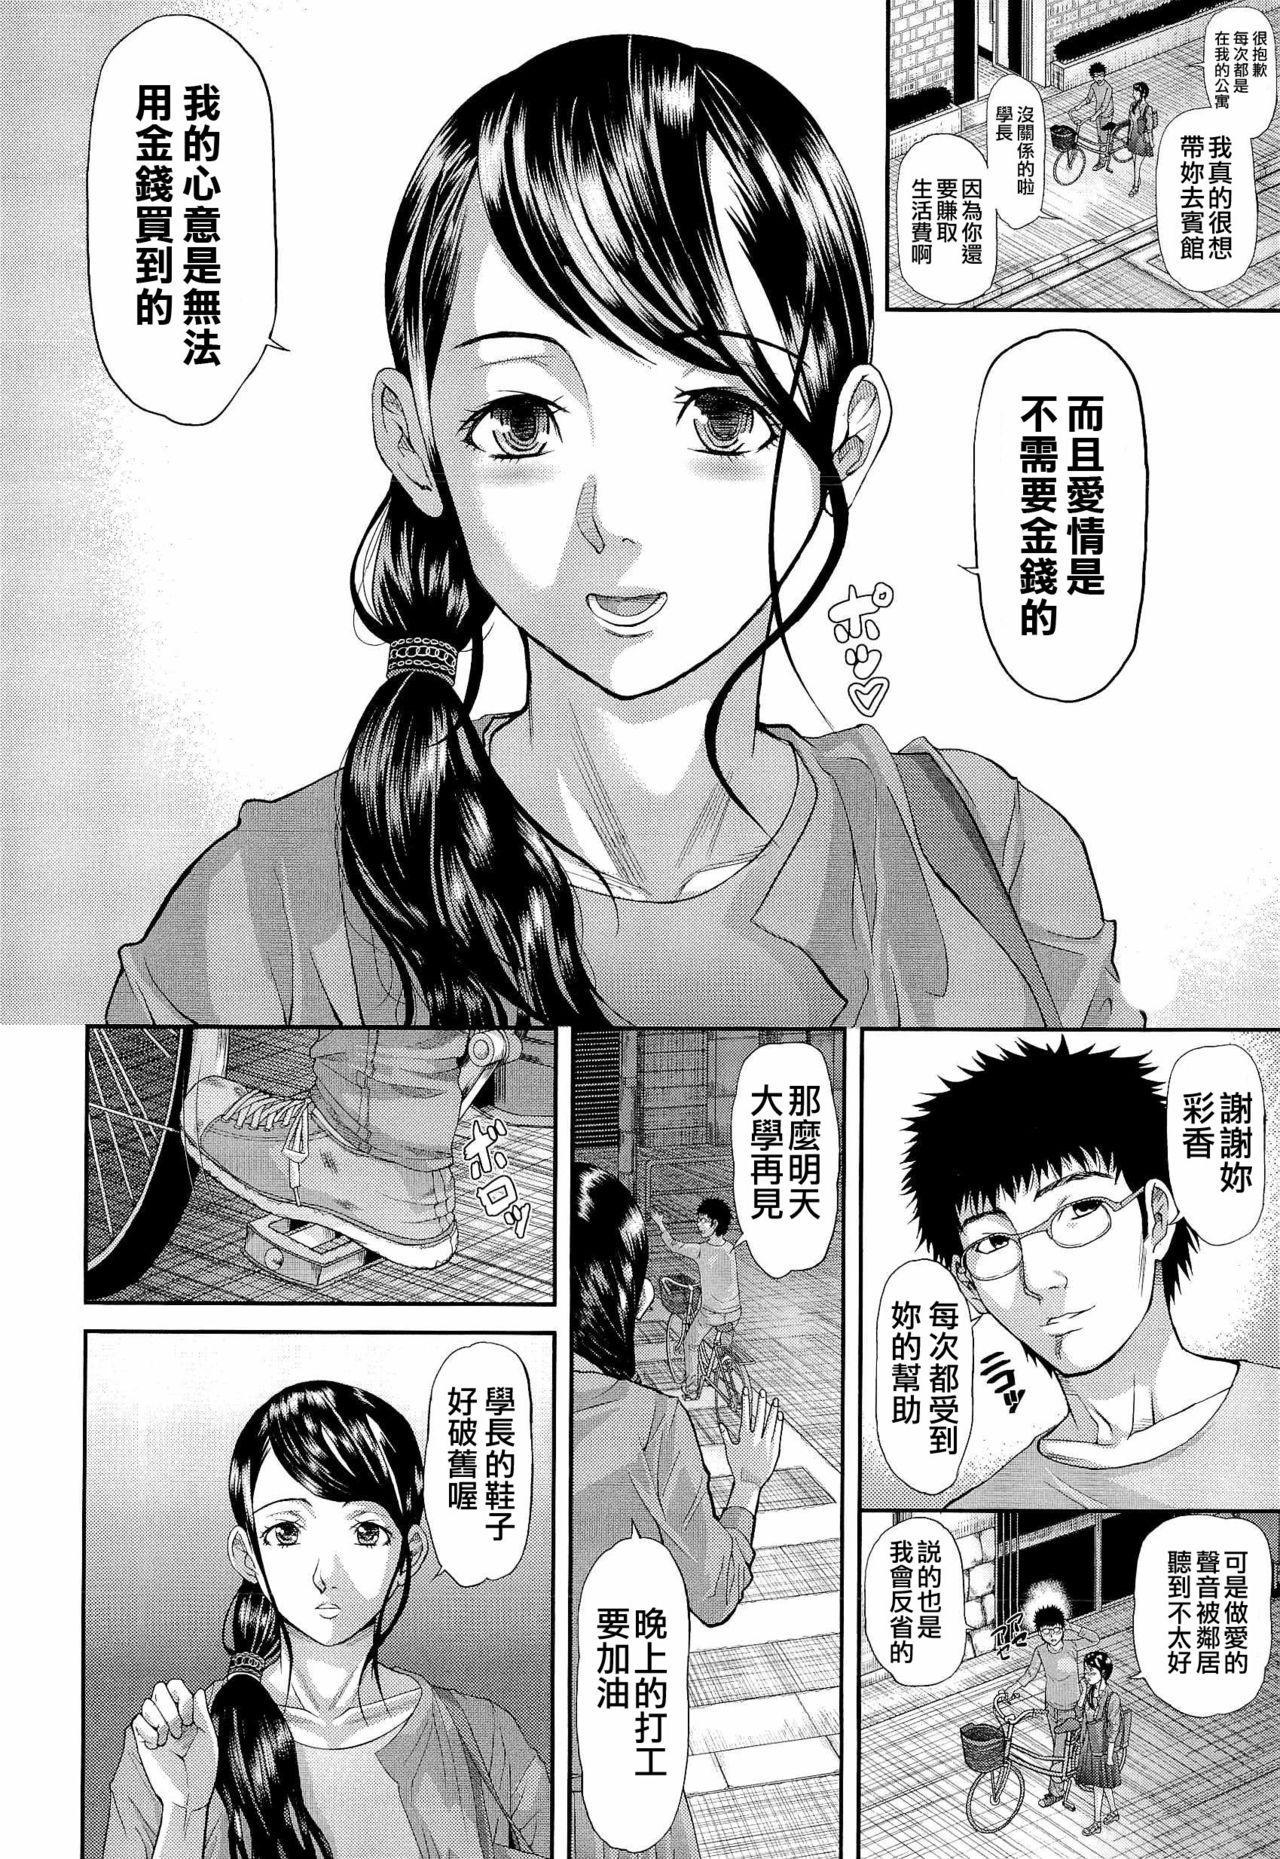 [Honebuto Danshaku] Innou Kaizou Program ~Oyako Zecchou Cult Ochi~ [Chinese]【不想记名重嵌--高质量图源】 106